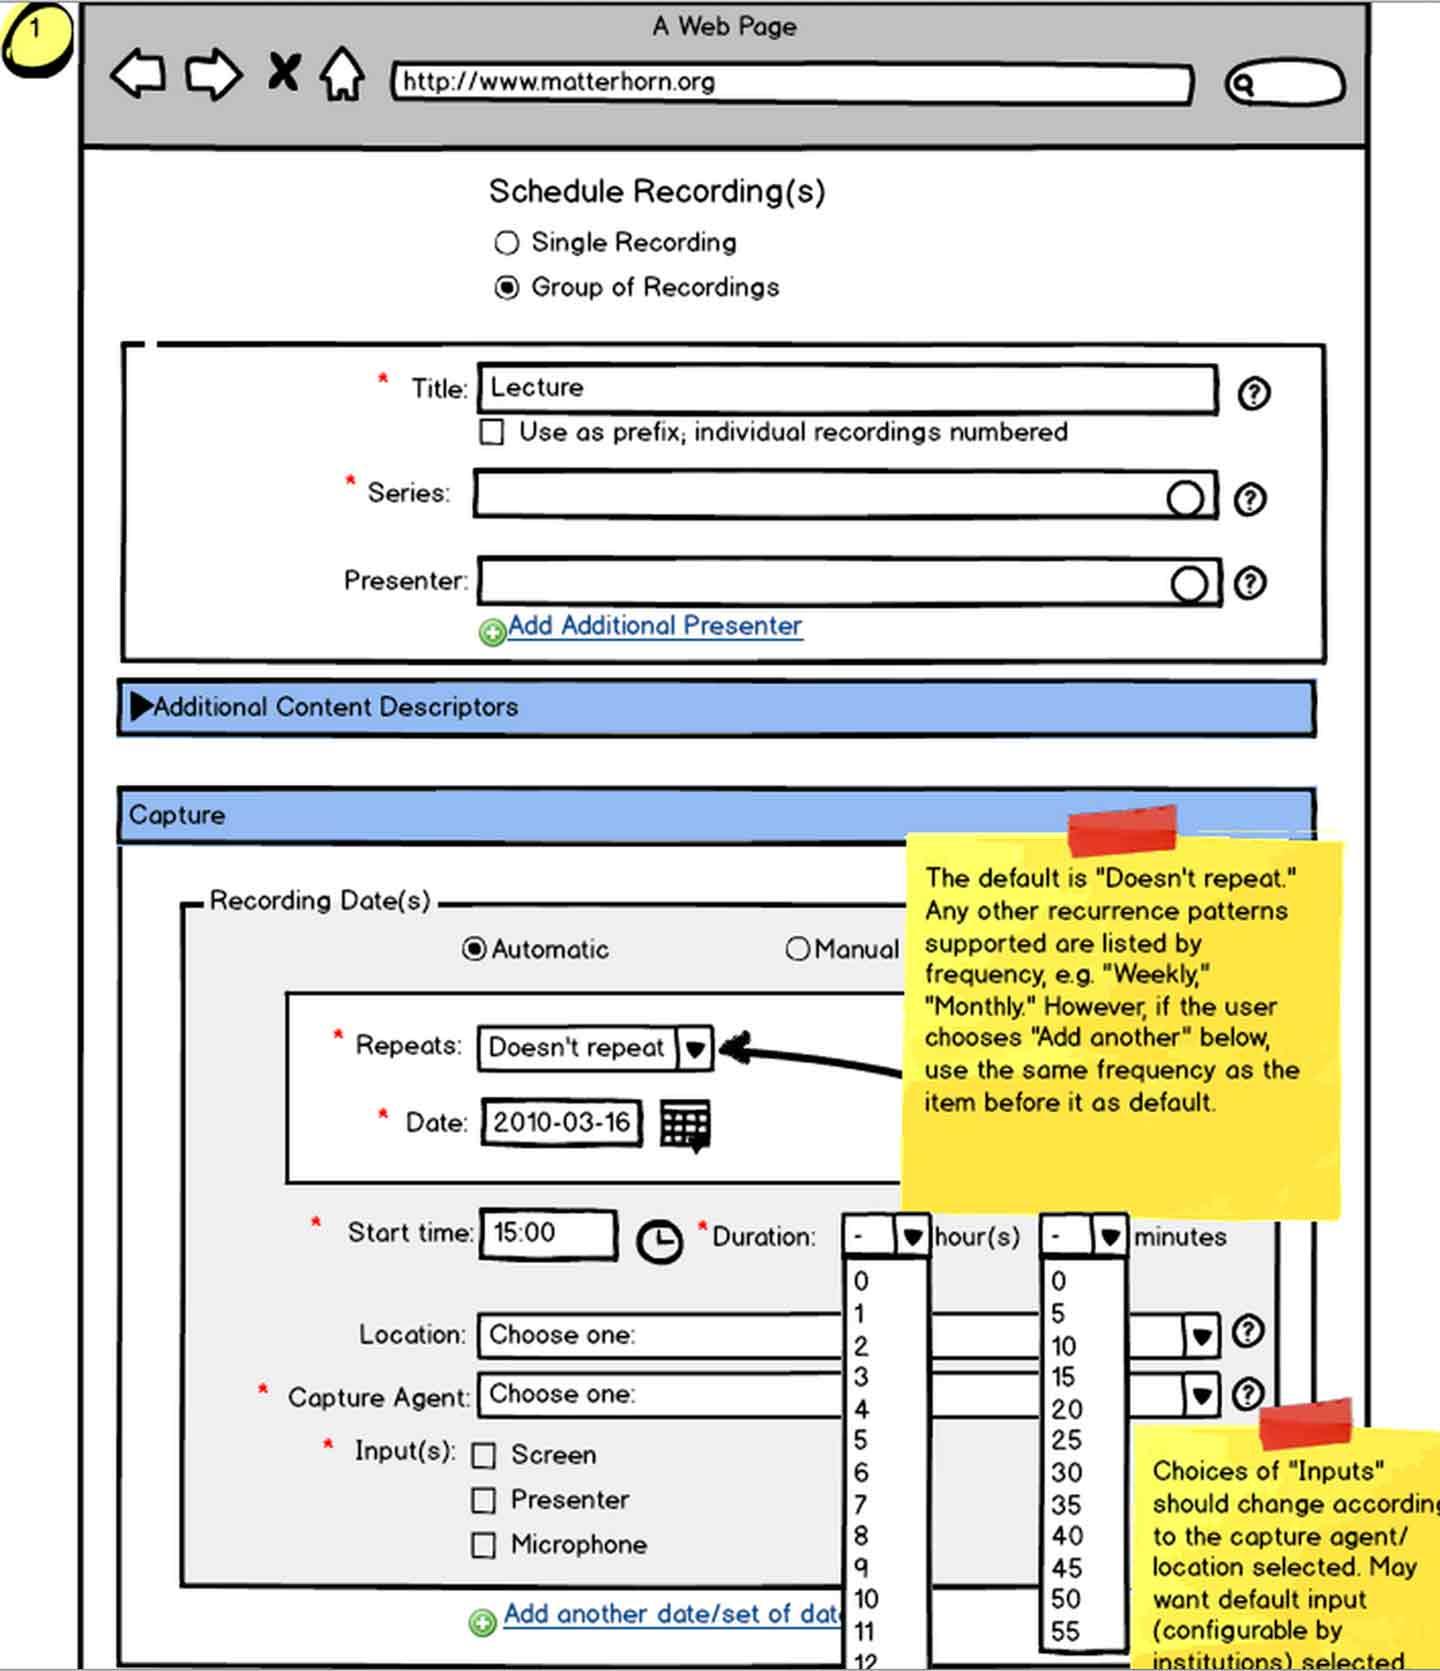 ScheduleRecordingsMultiple_REV1_web_Low_7